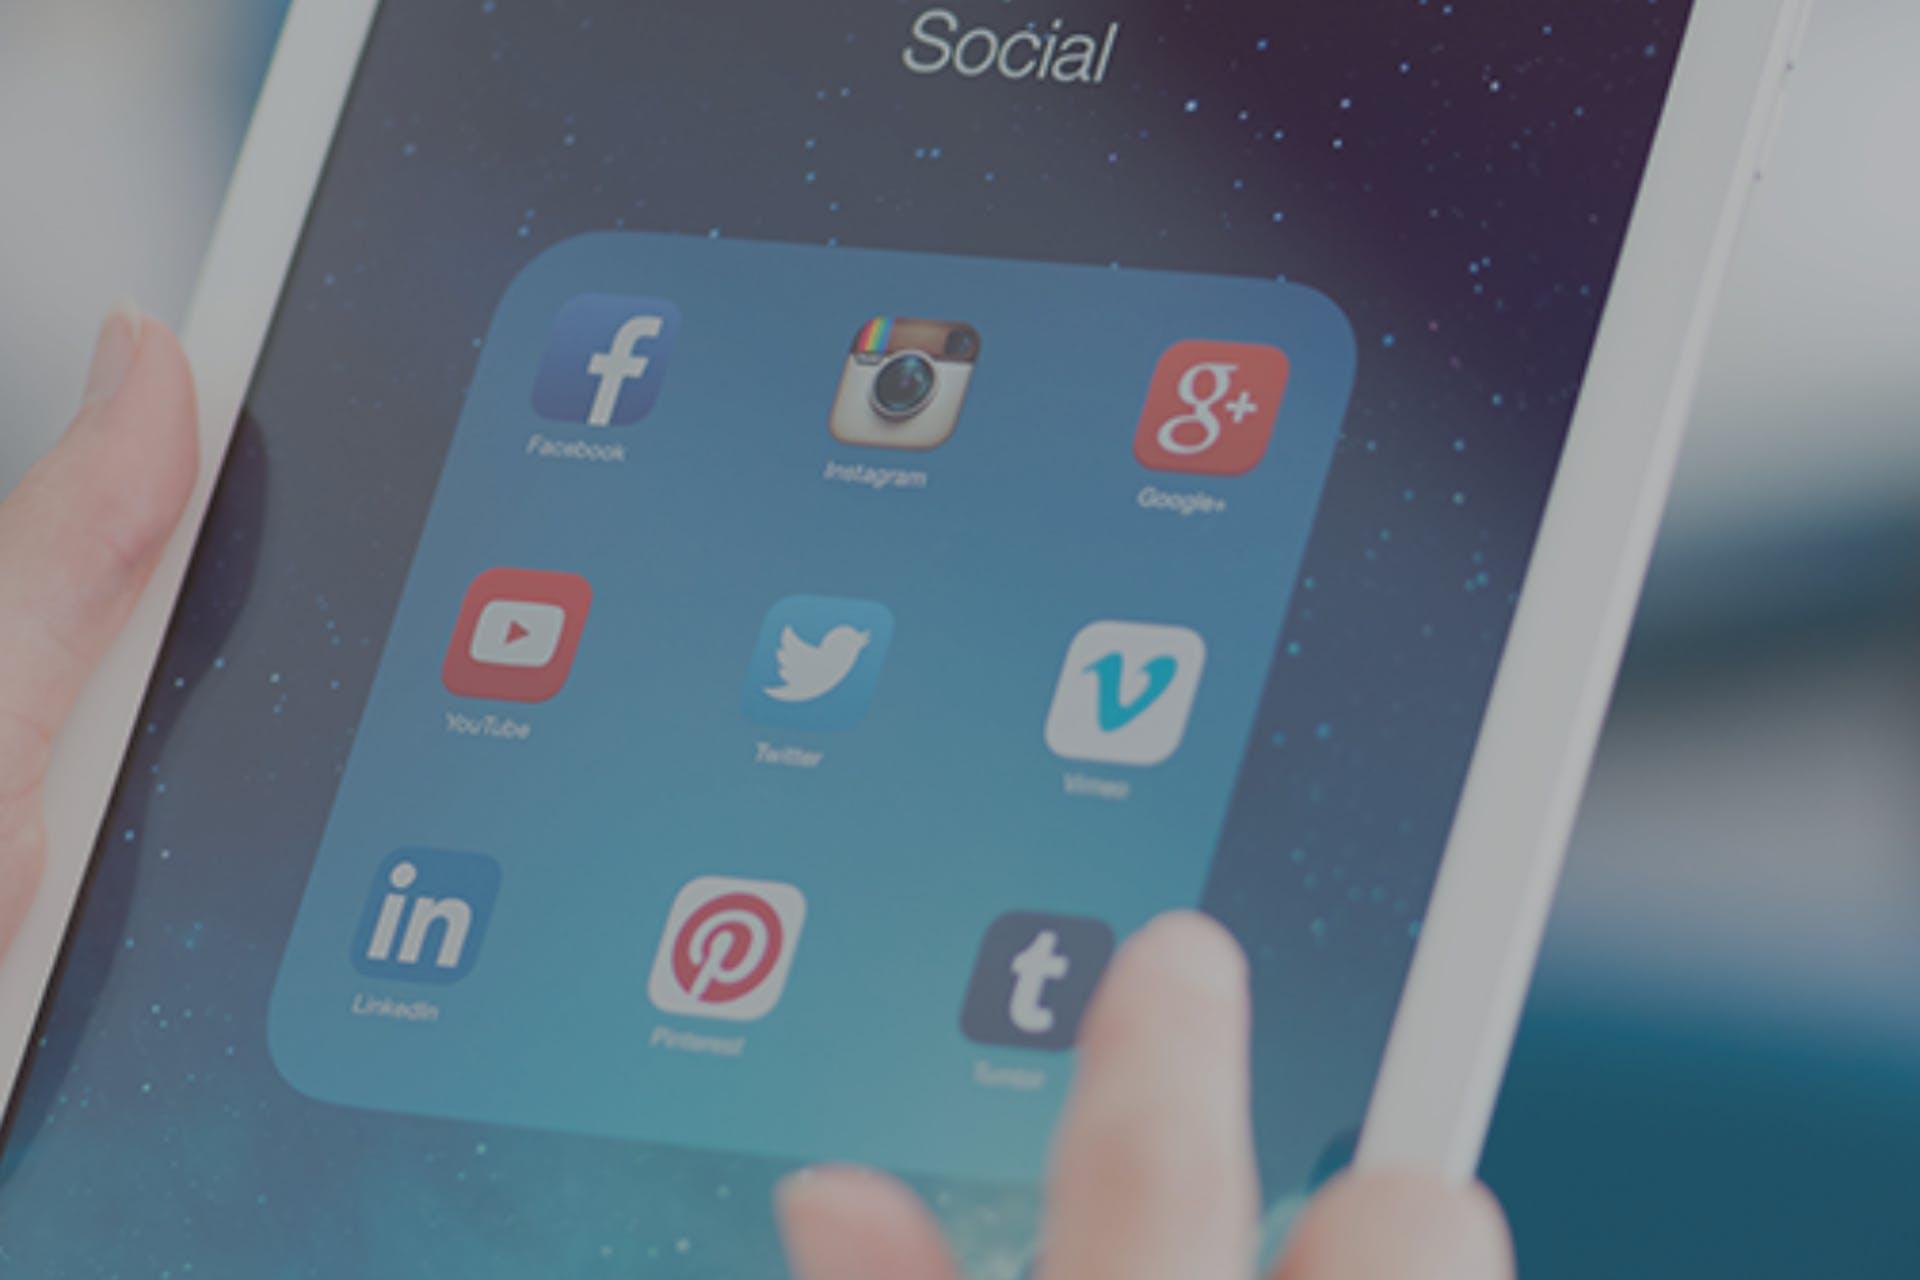 Post on social